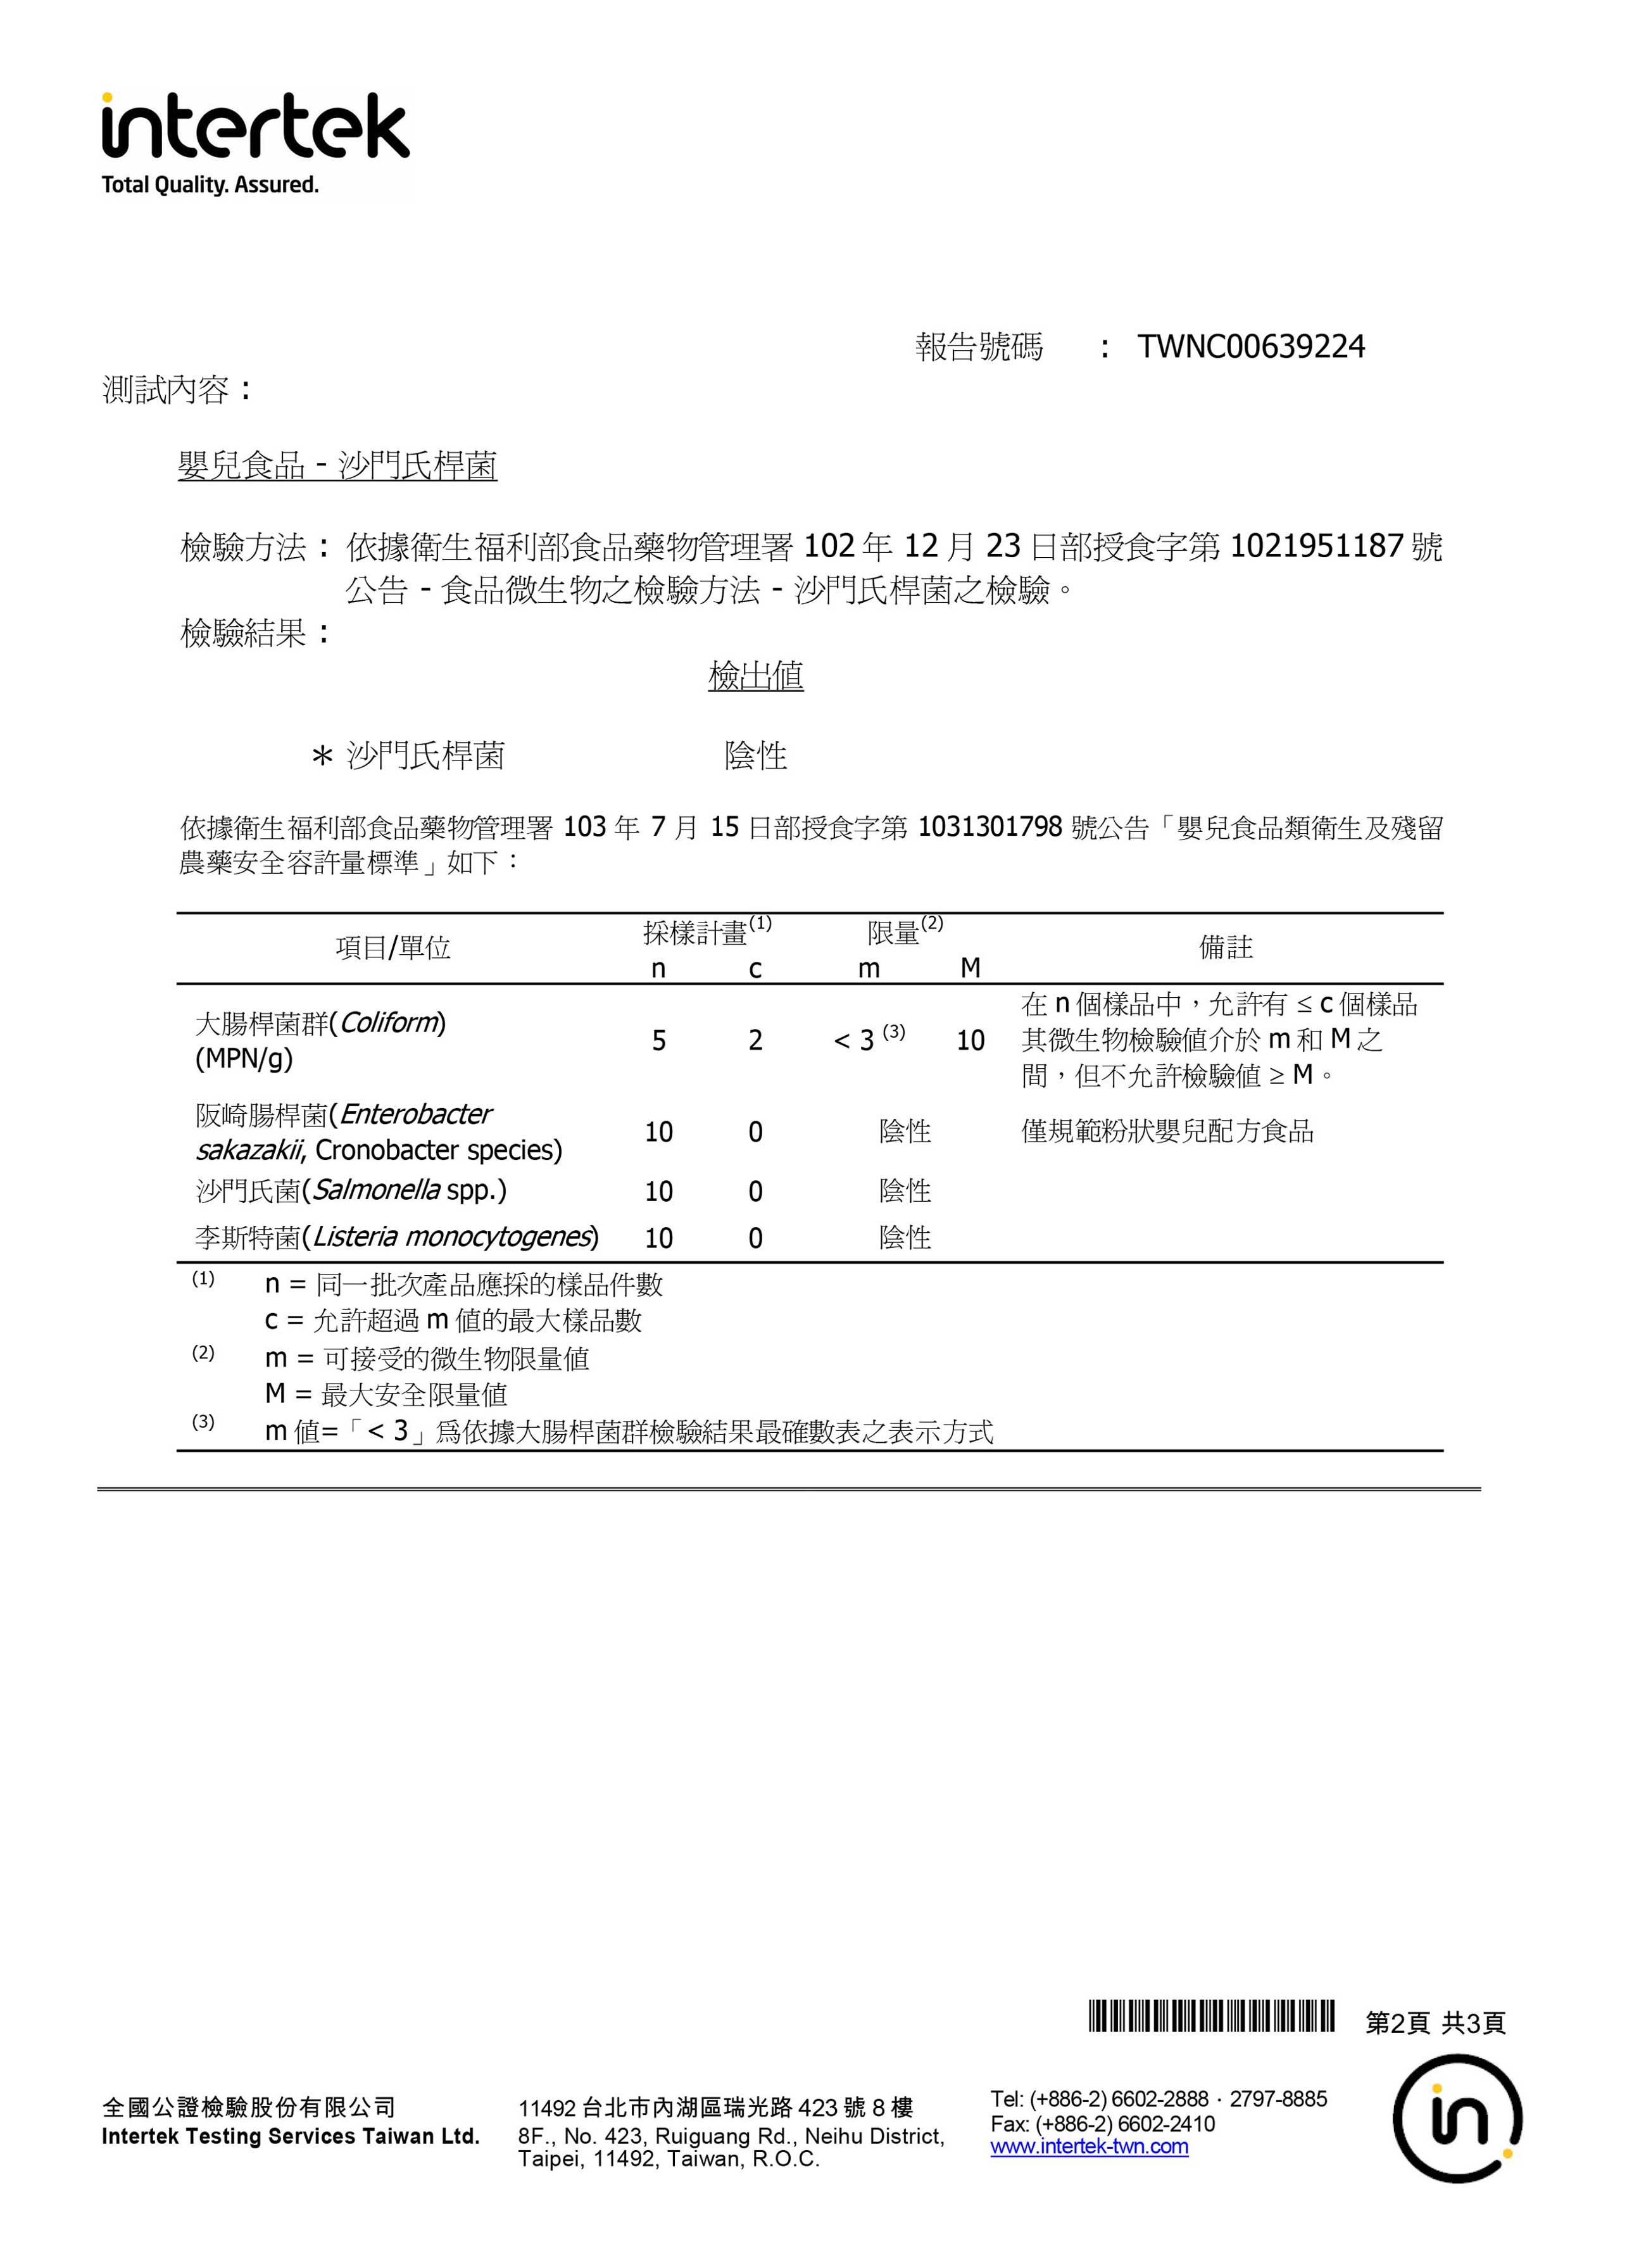 proimages/news/2017/Q3-42_金愛斯佳育嬰配方食品900g罐_檢驗報告_20171011-2.jpg